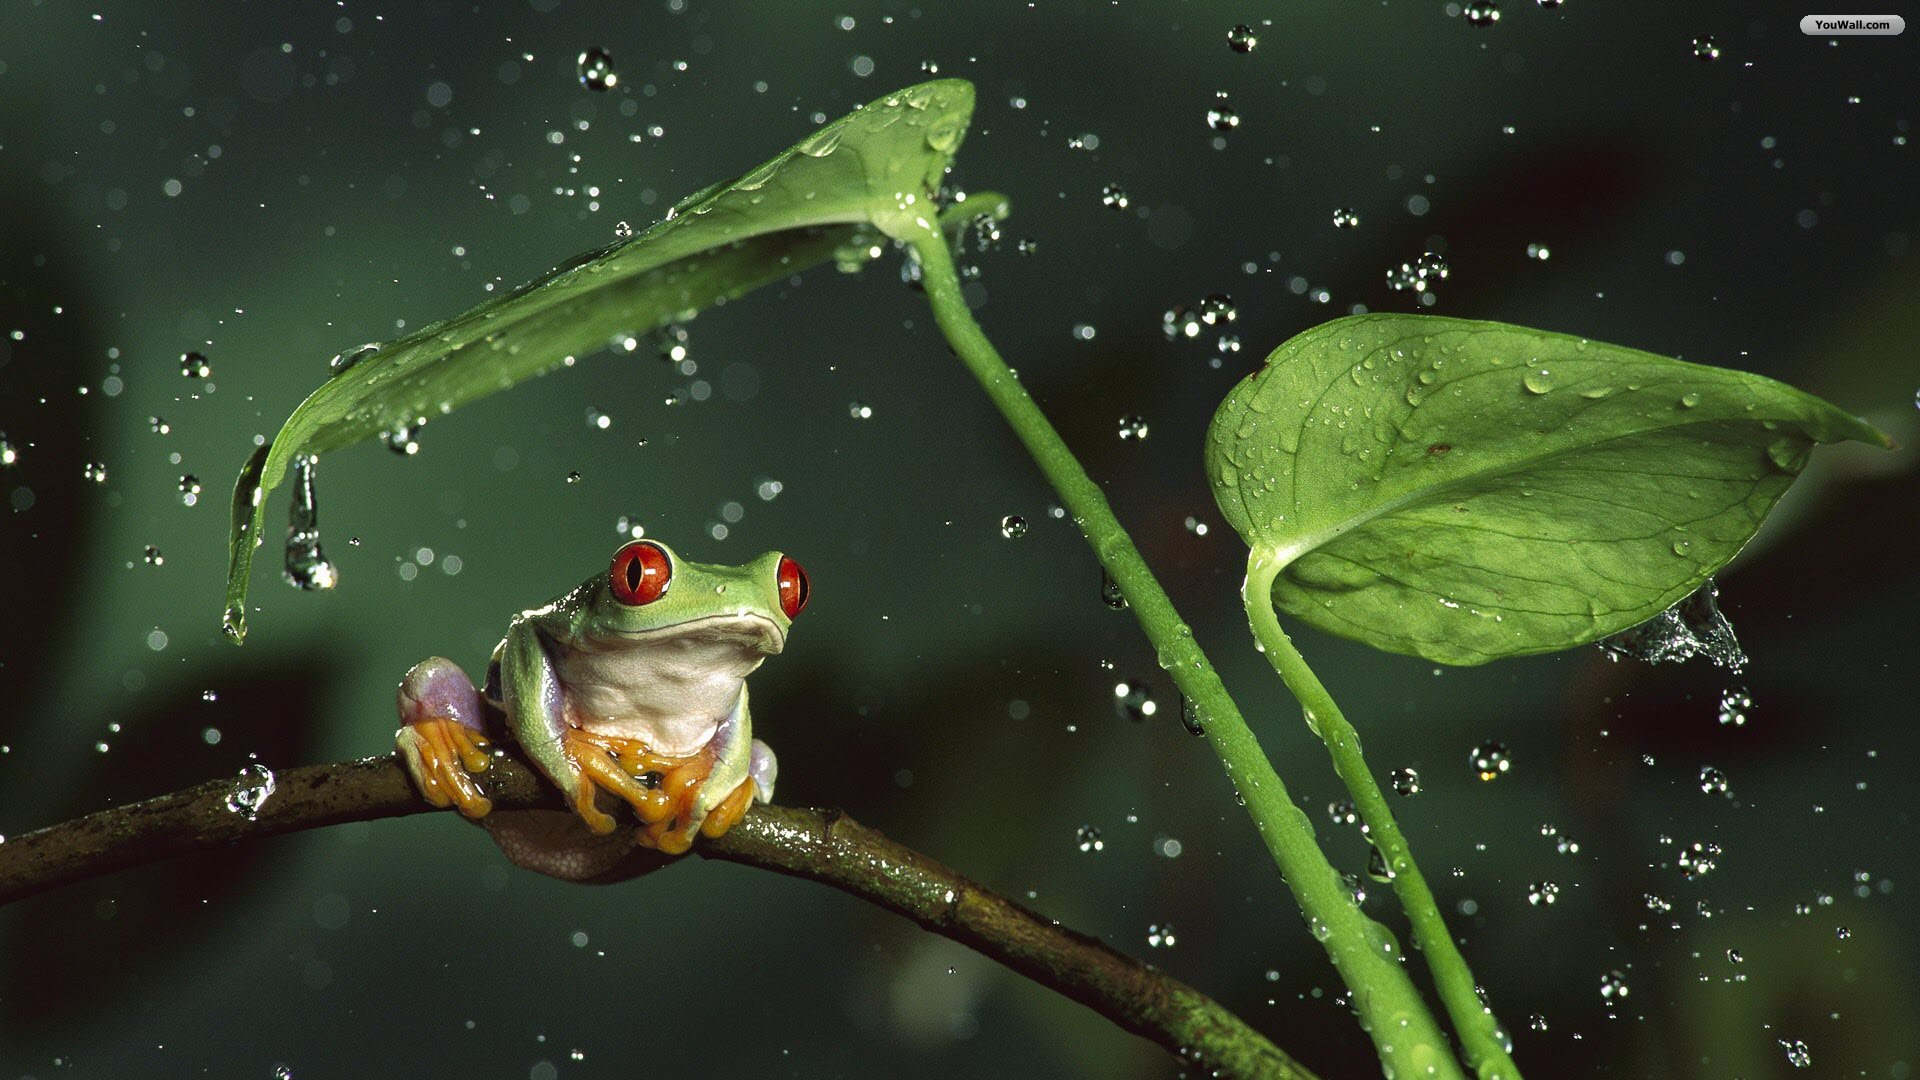 Frog Rain Wallpaper Photos HD